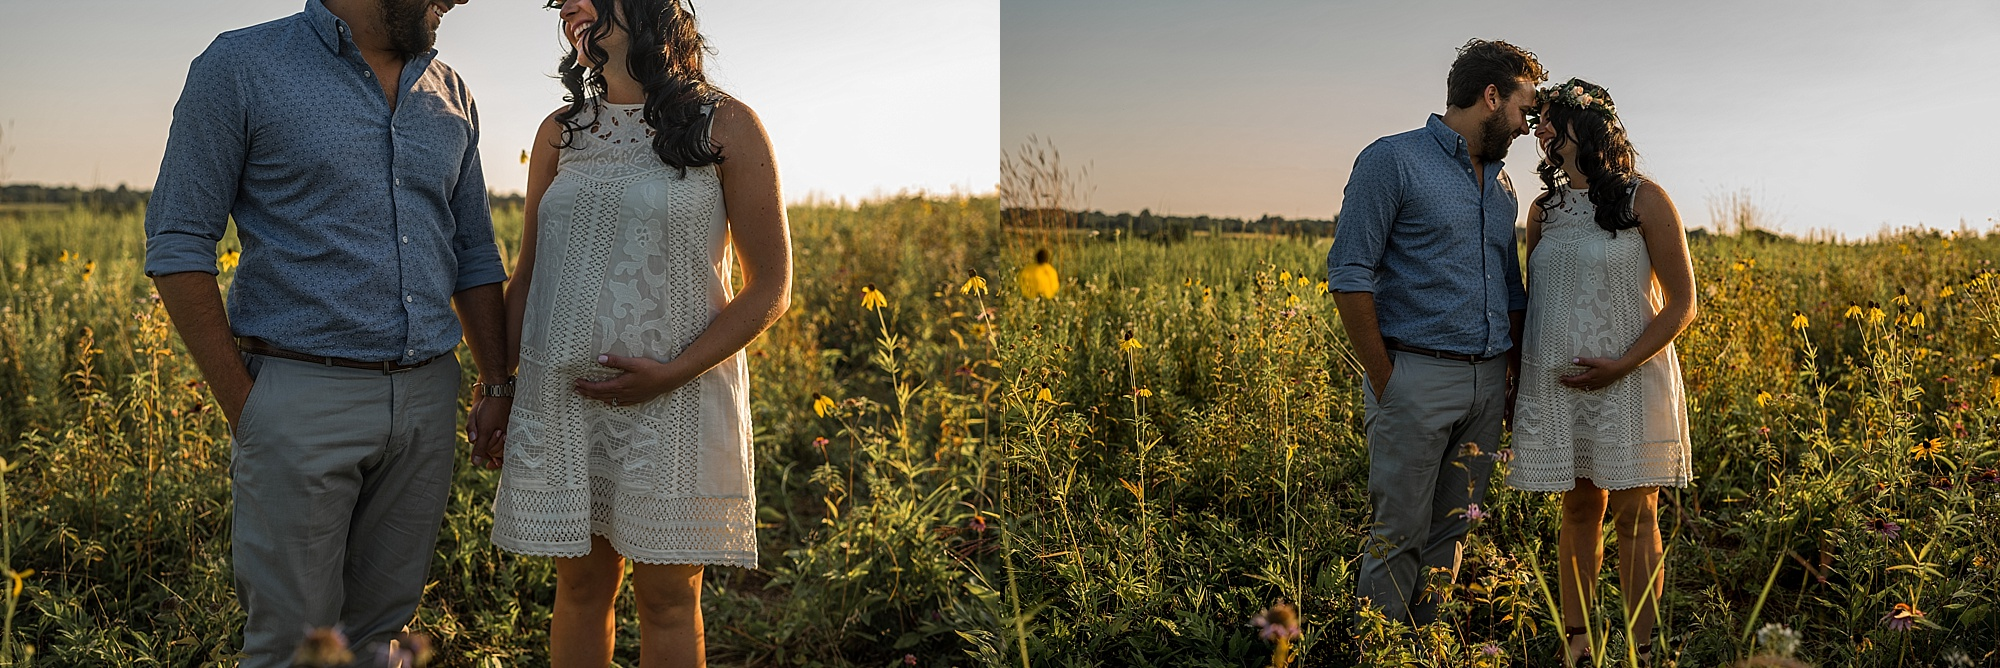 lauren-grayson-photography-cleveland-ohio-photographer-maternity-summer-outdoor-bohemian-fields-session_0486.jpg